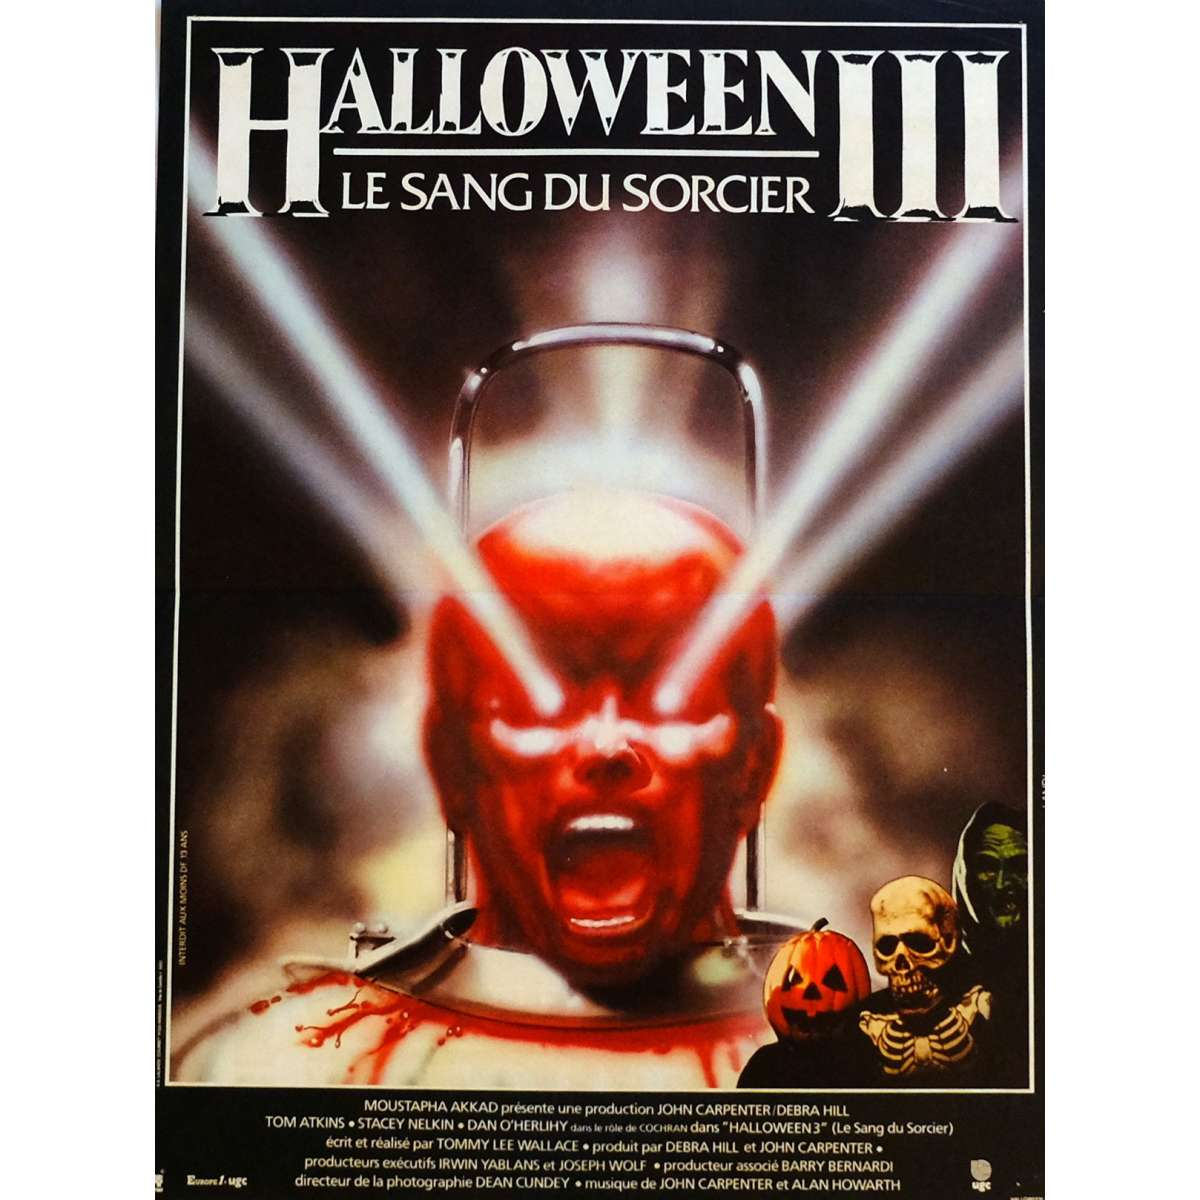 HALLOWEEN III Movie Poster